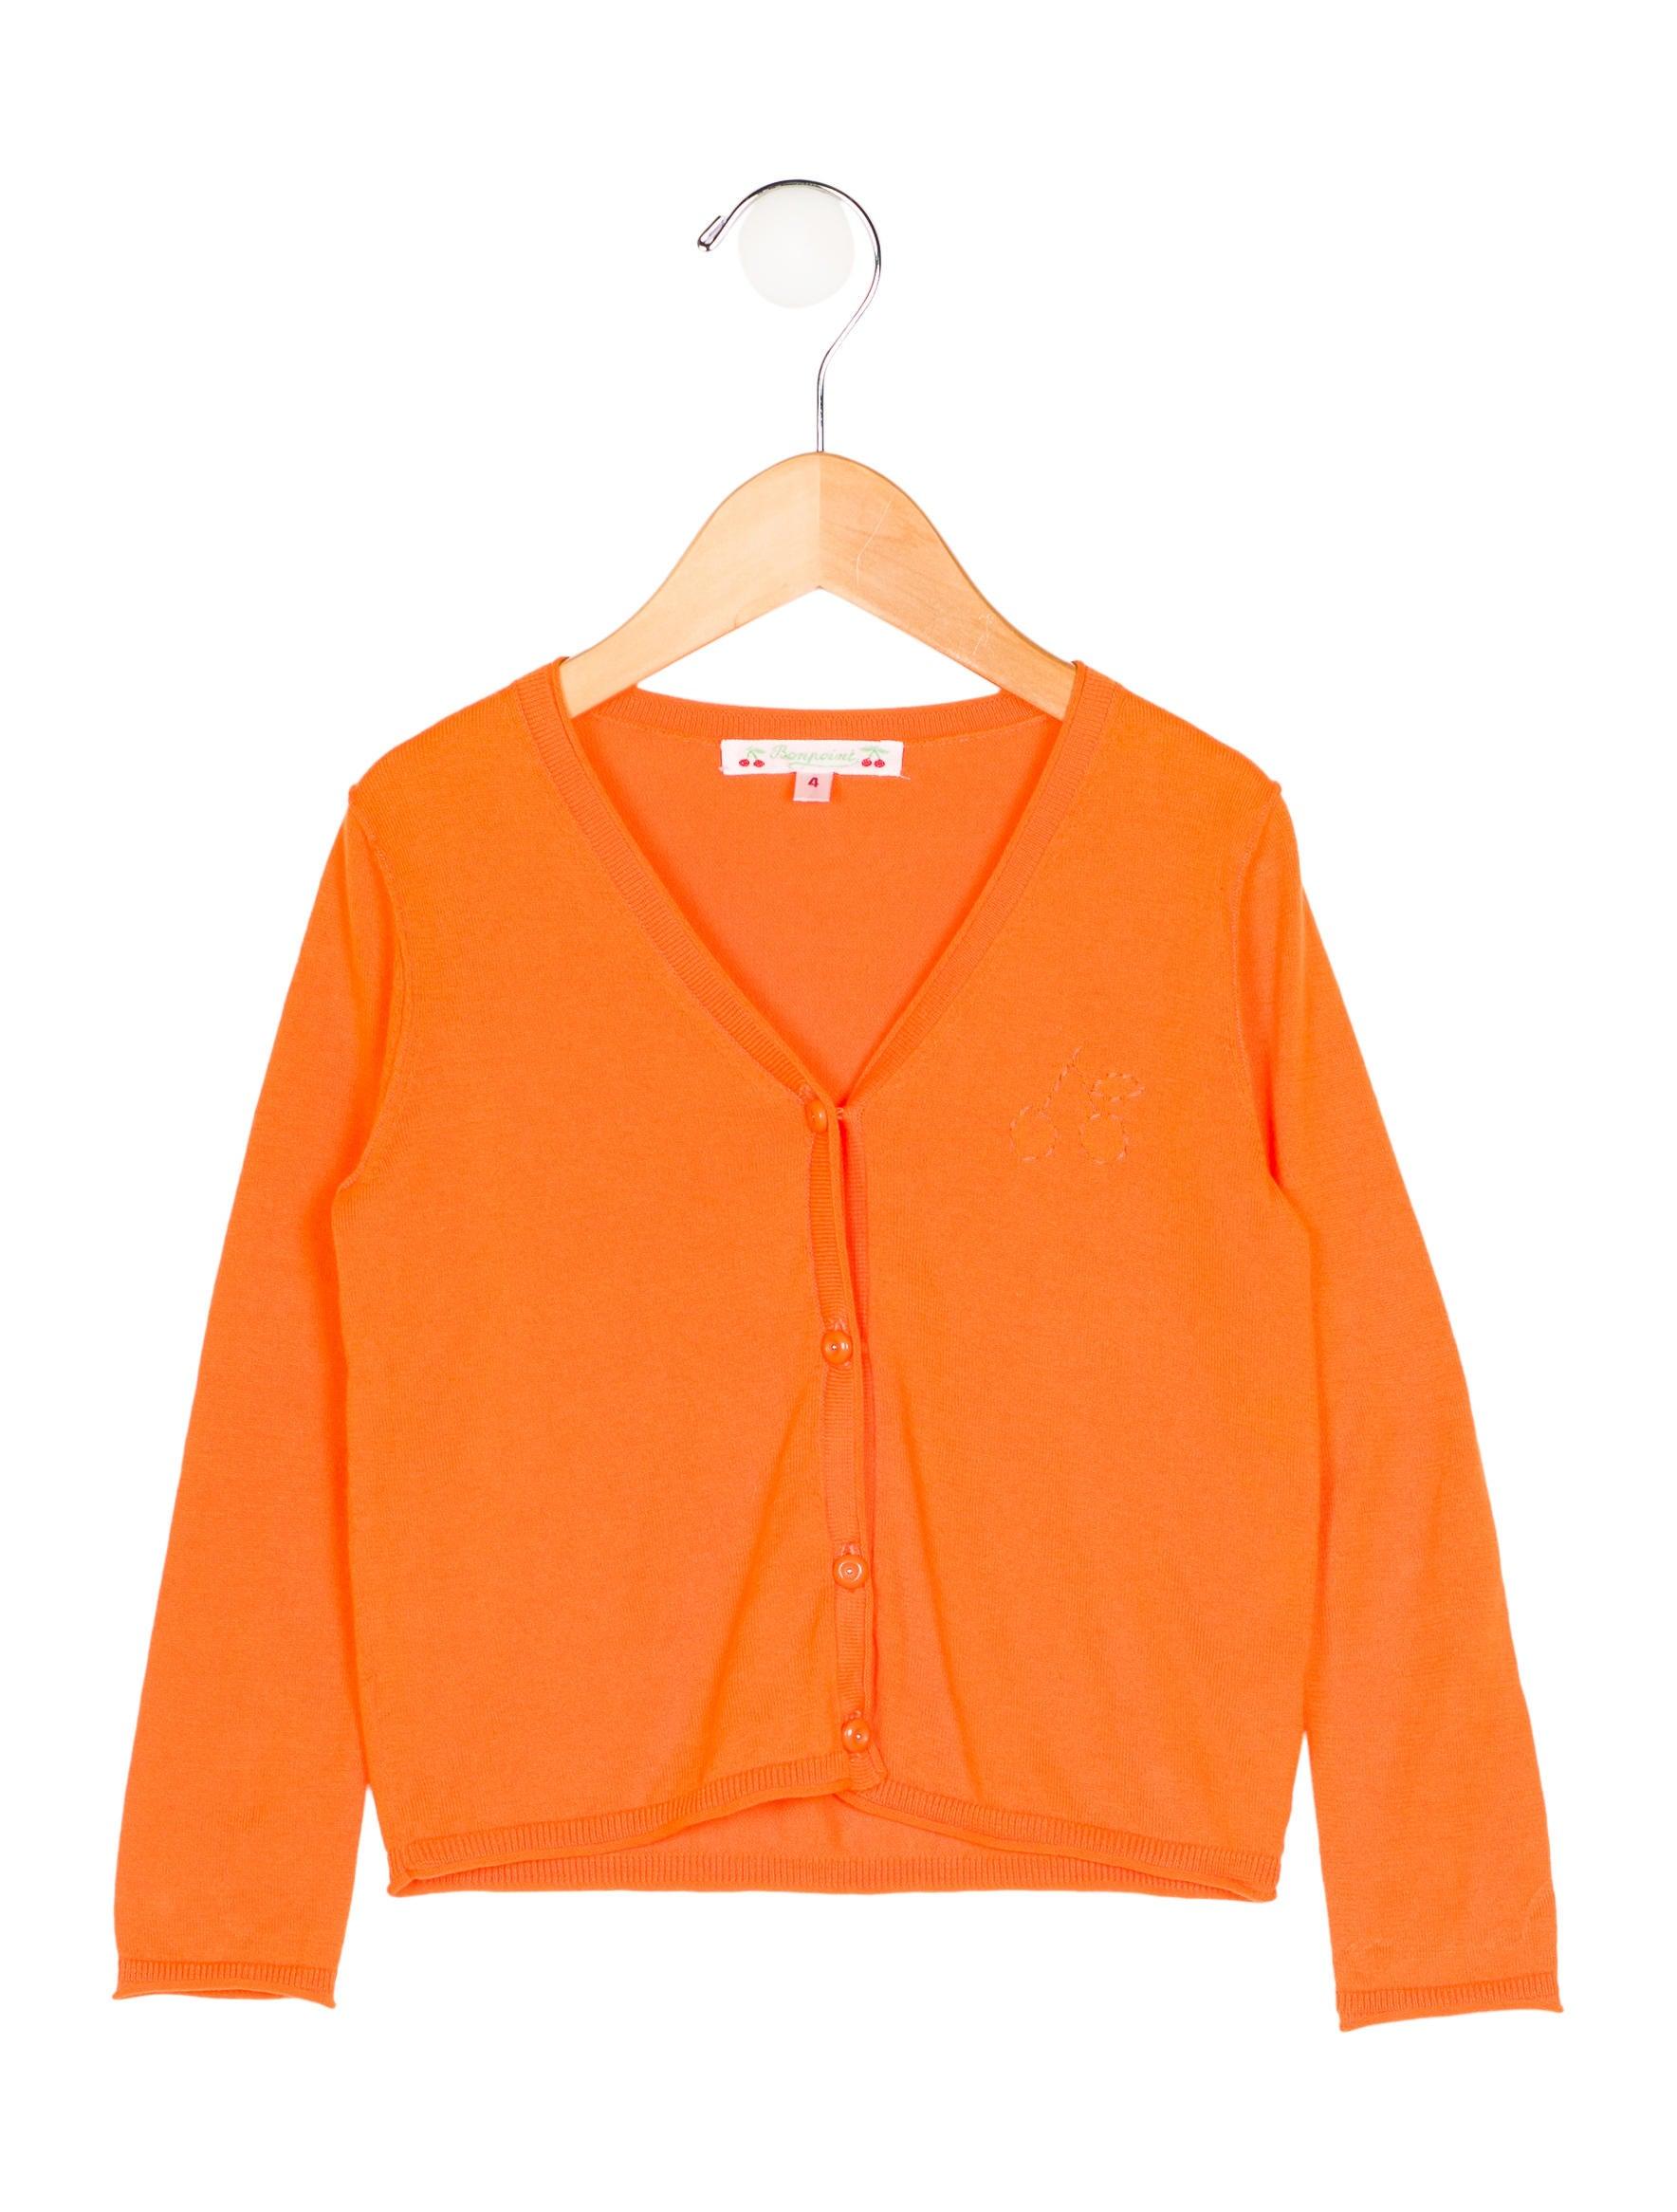 Bonpoint Girls' Embroidered Rib Knit Cardigan - Girls - WBONP23523 ...